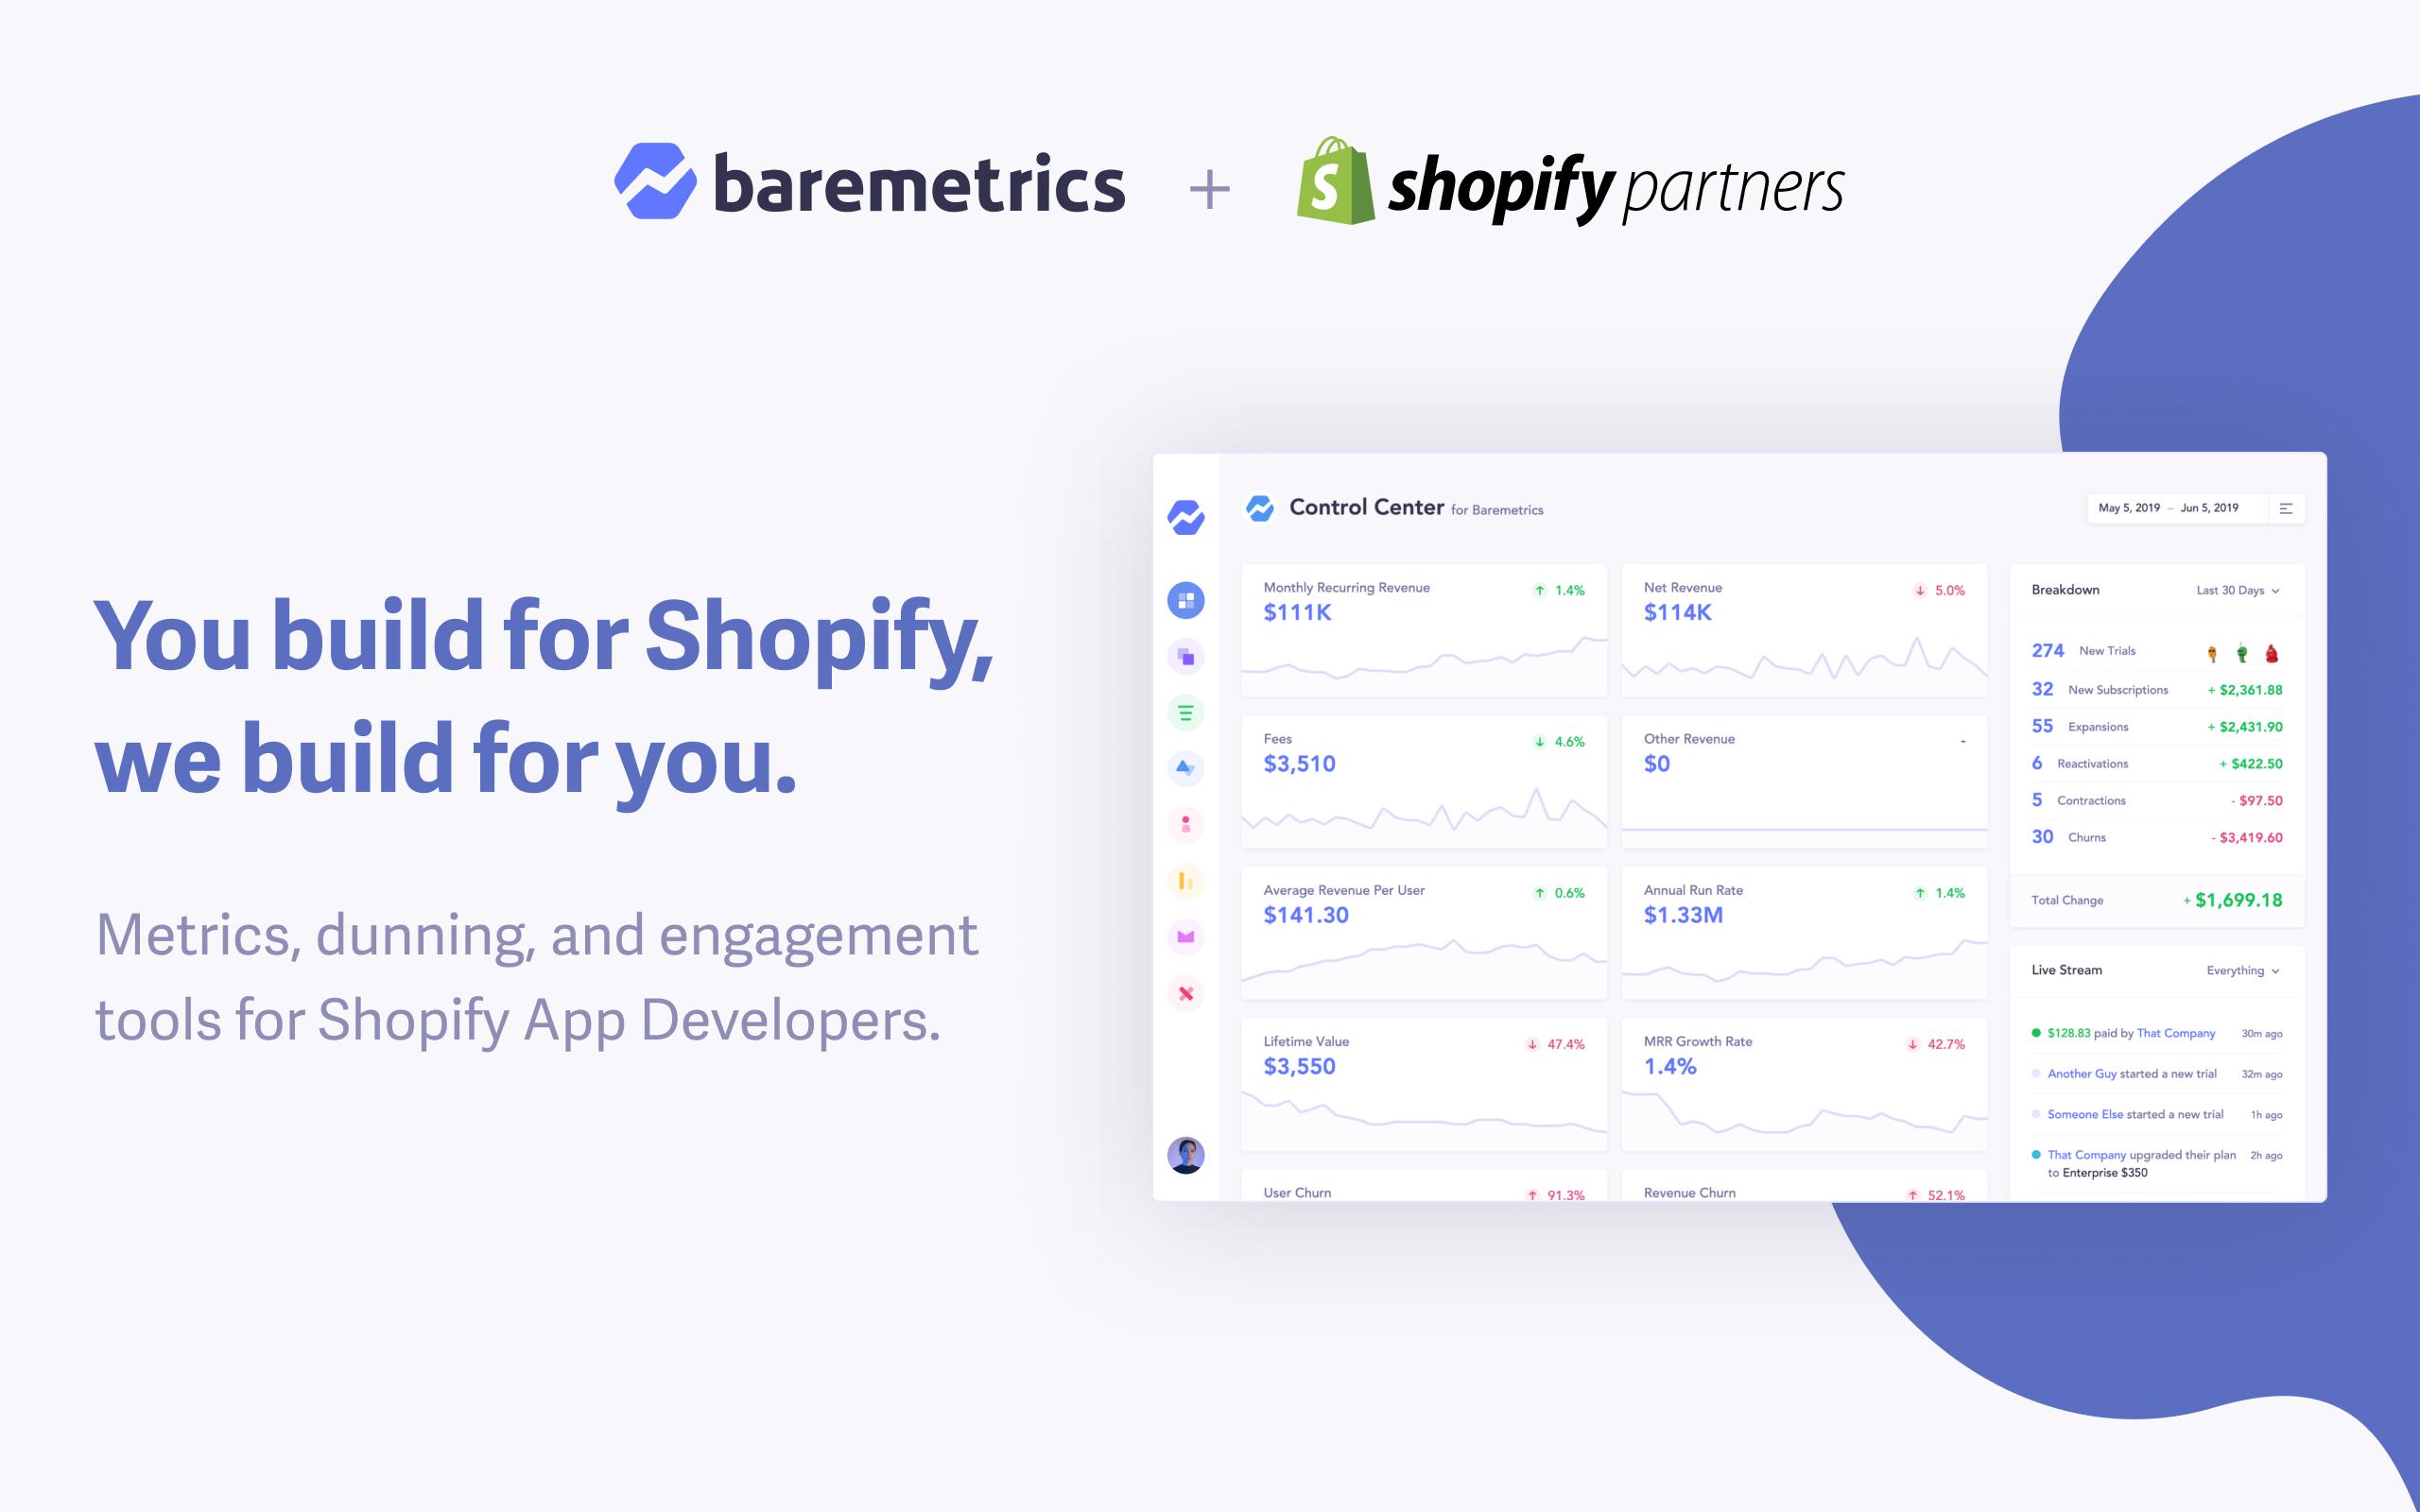 Shopify Partners - Baremetrics